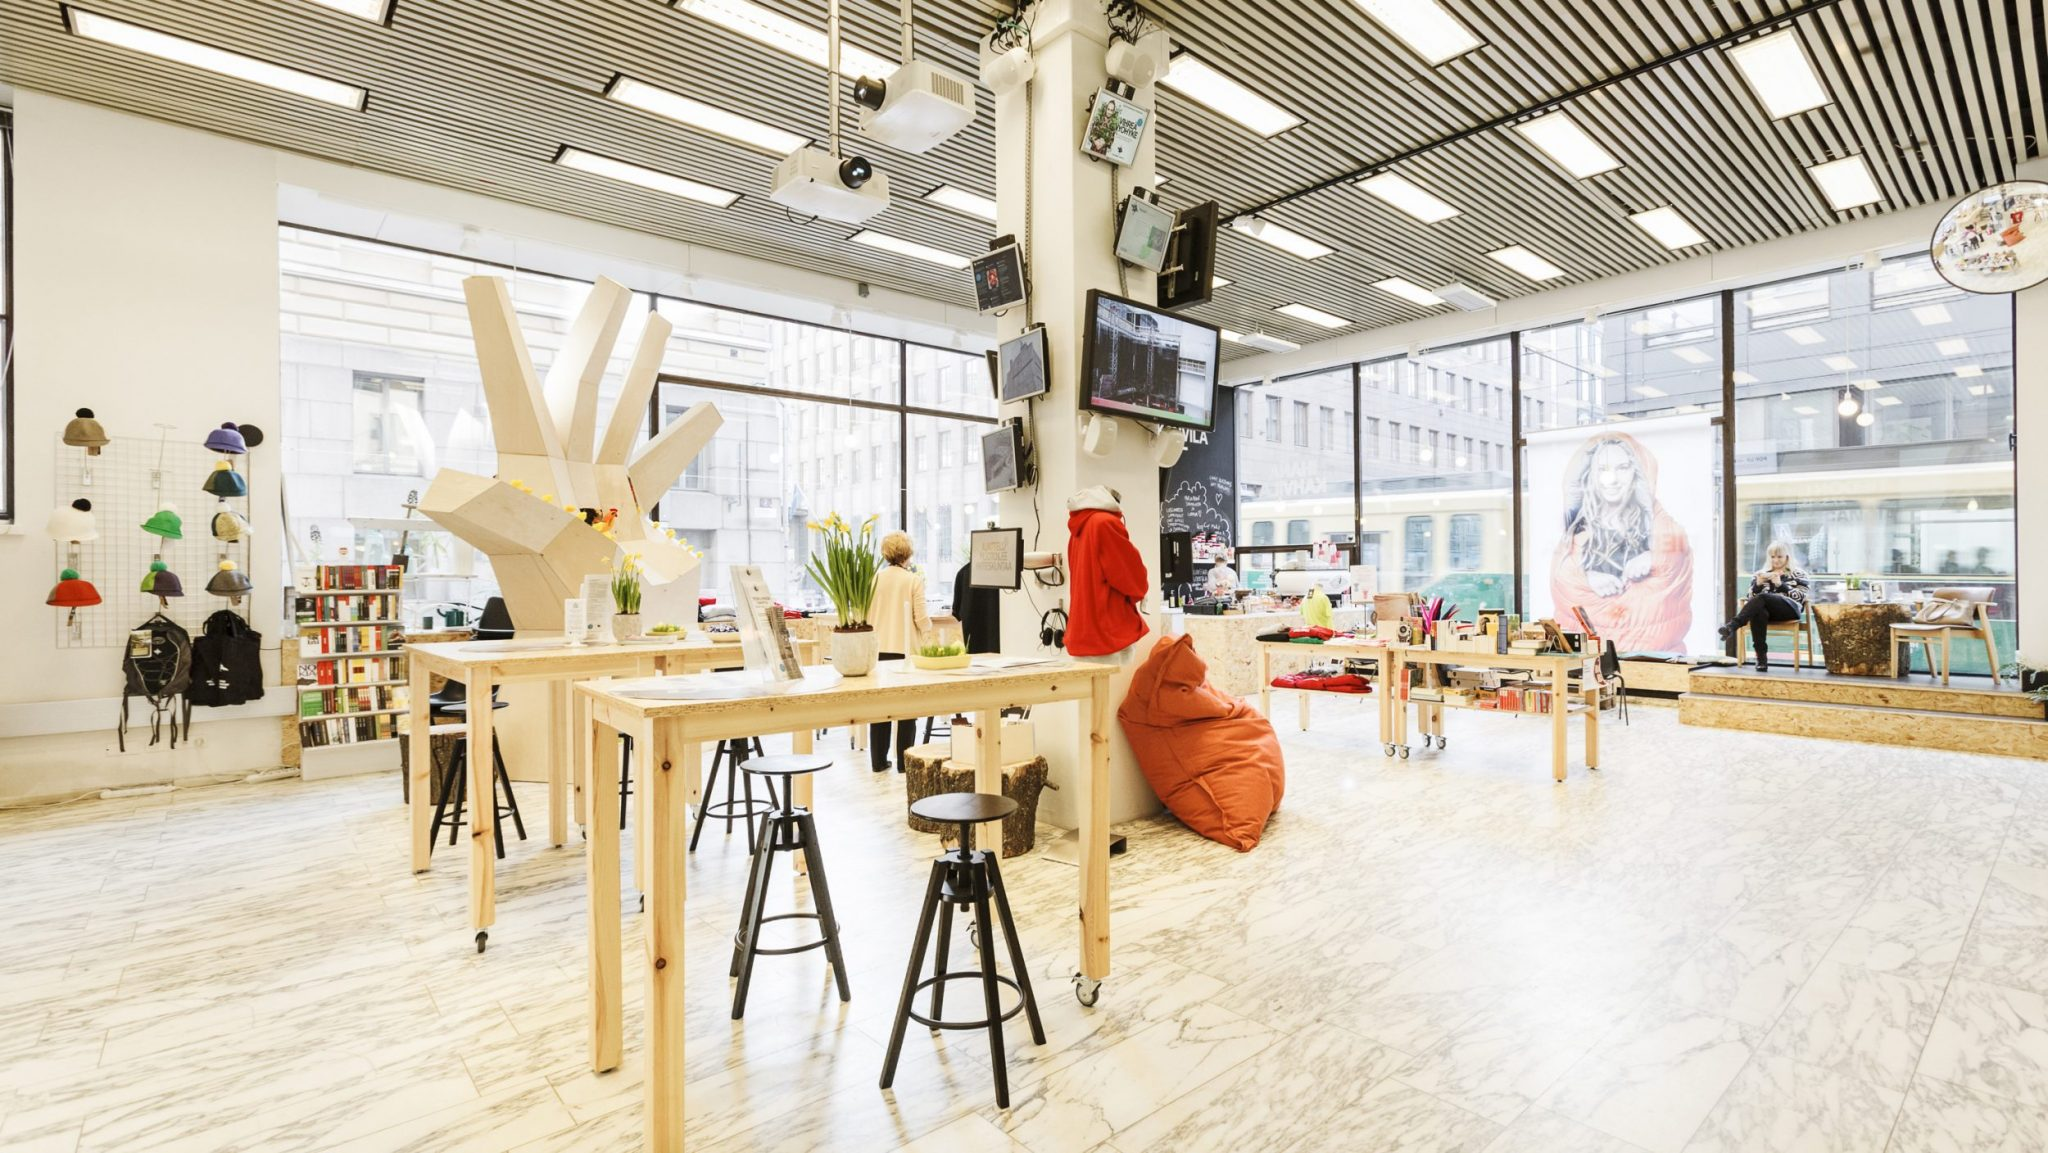 Think-Corner-pop-up-store-Aleksanterinkatu-Helsinki-GI-Project